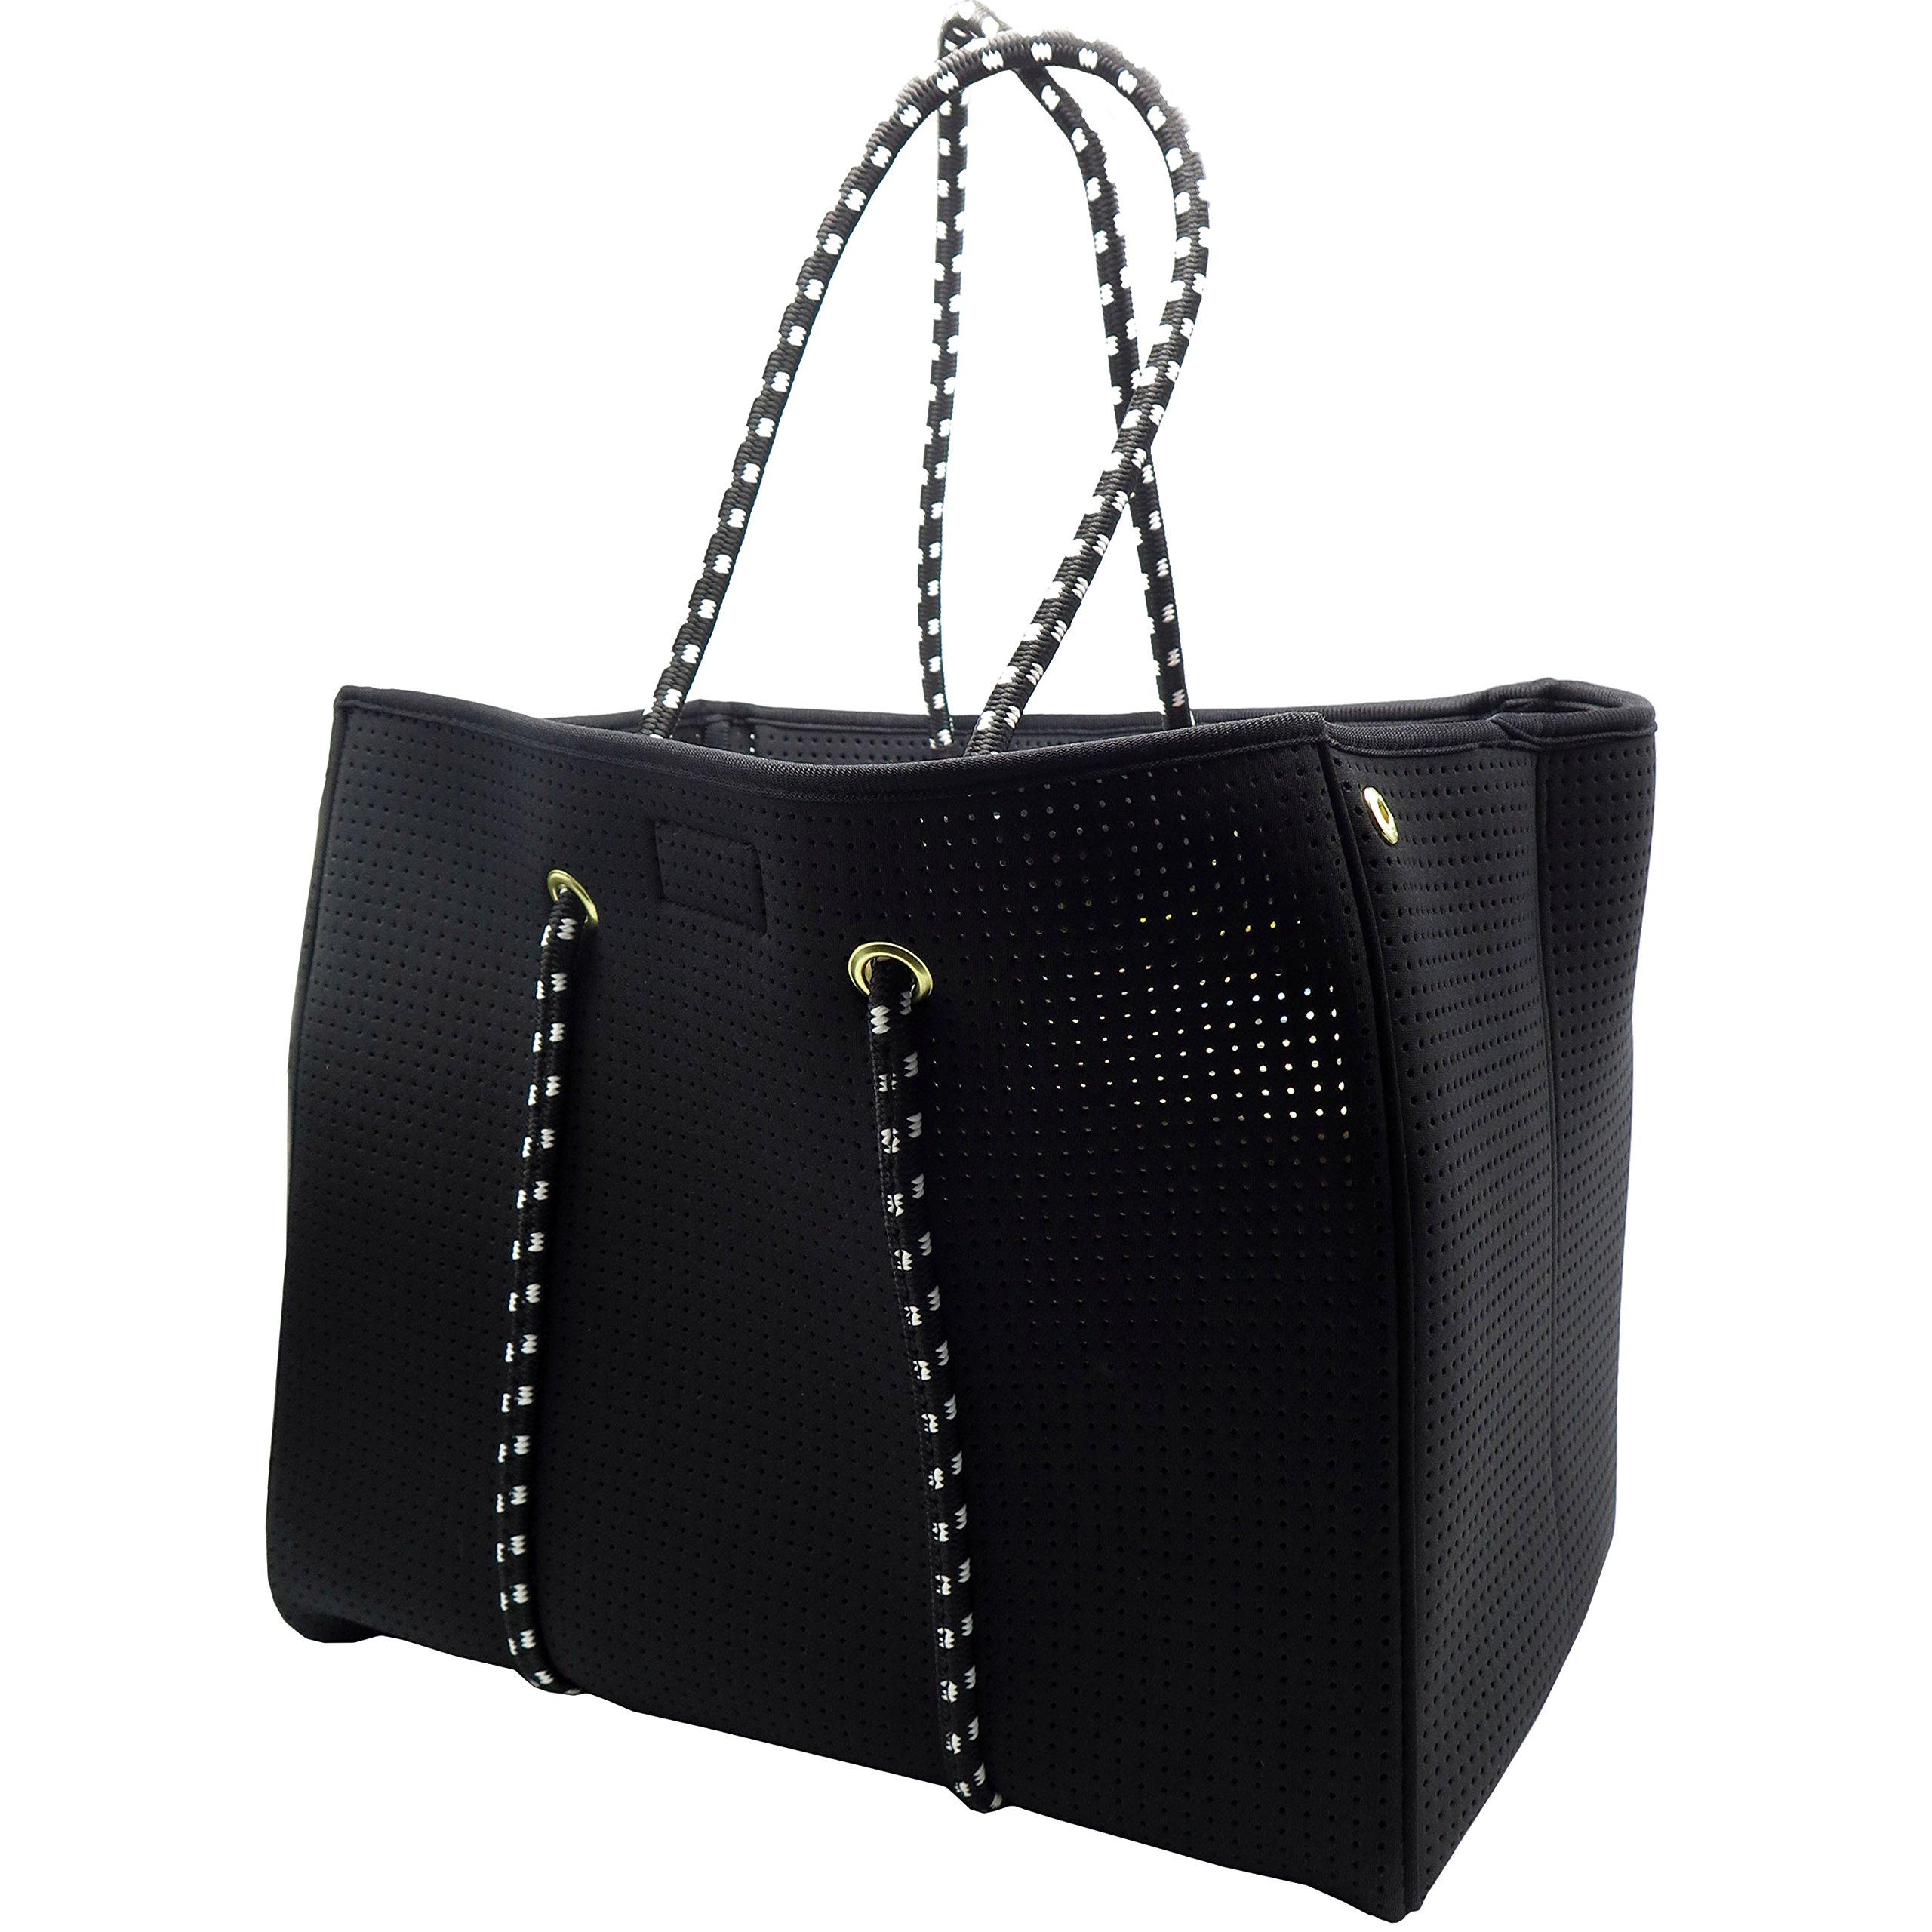 Neoprene Beach Bag tote - Large Daily Mesh Bag by Penn & Soph (Black)